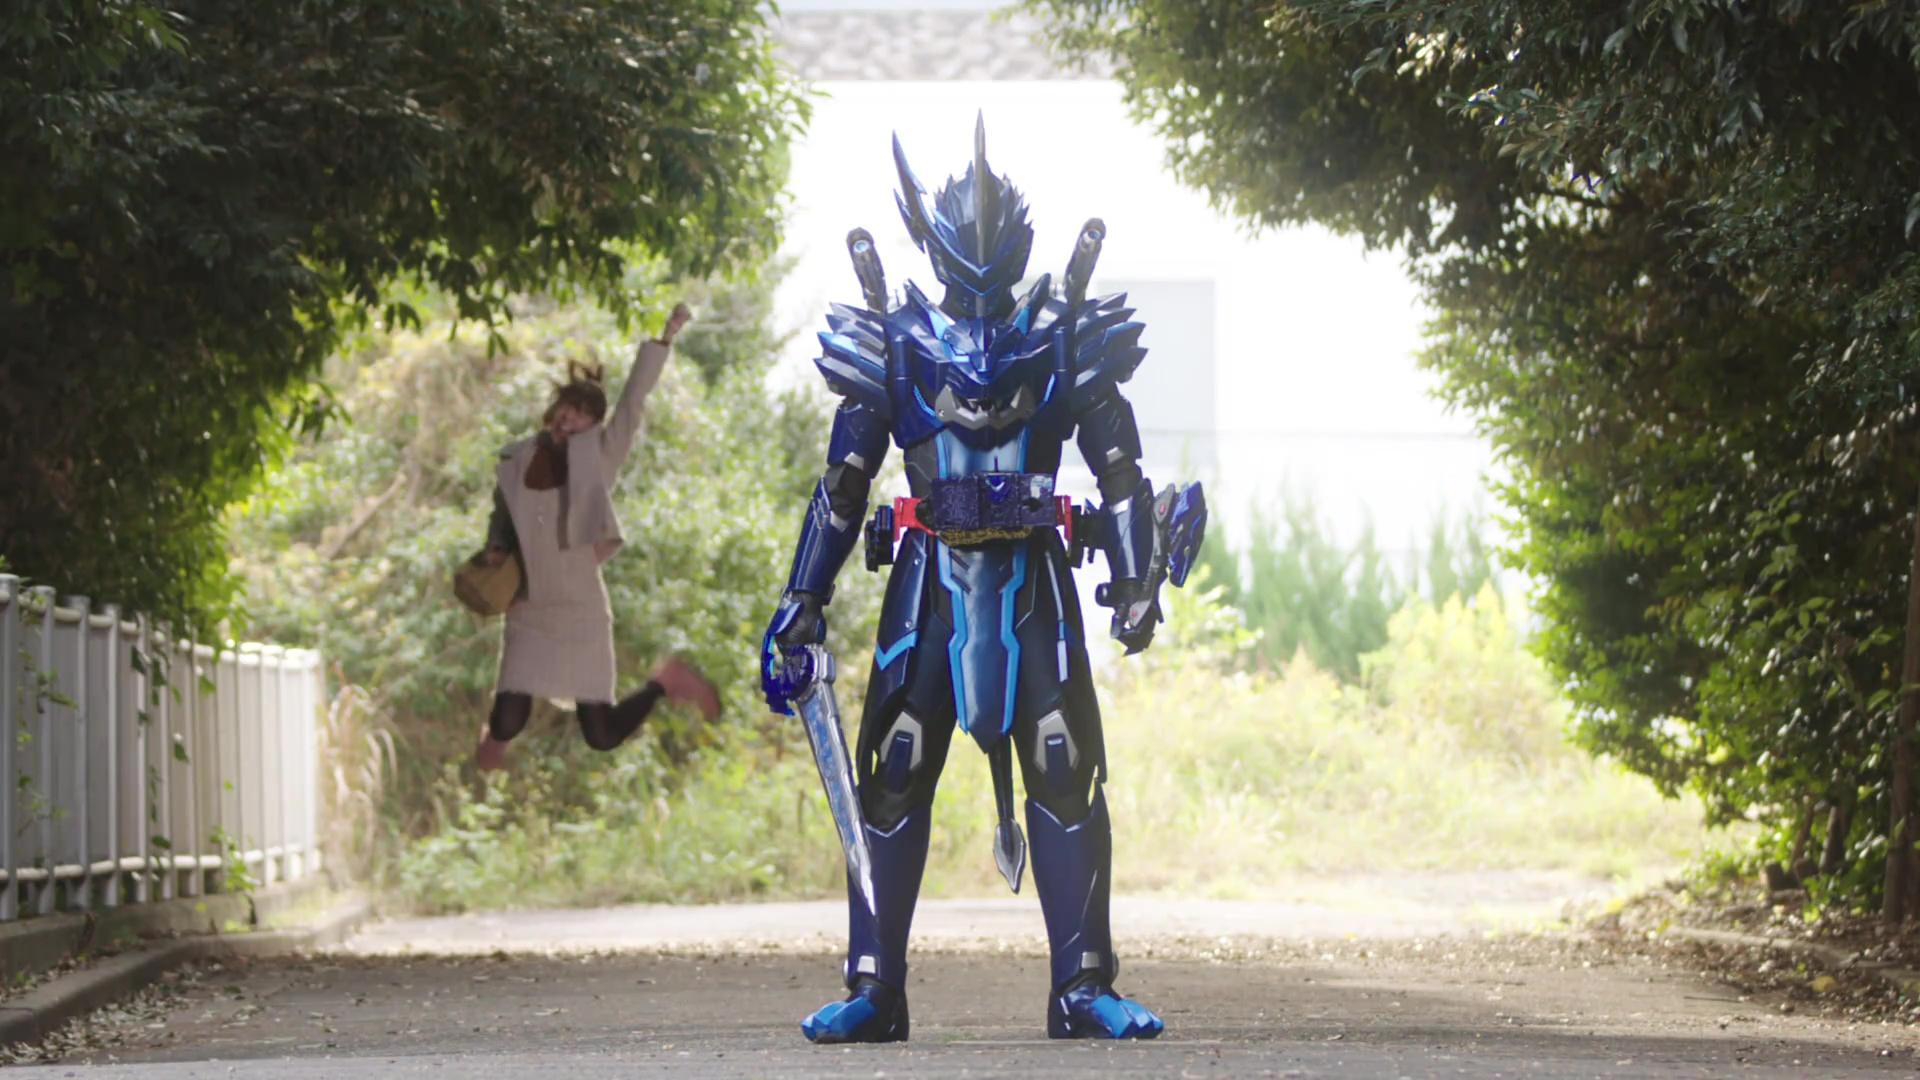 Kamen Rider Saber Episode 14 Recap